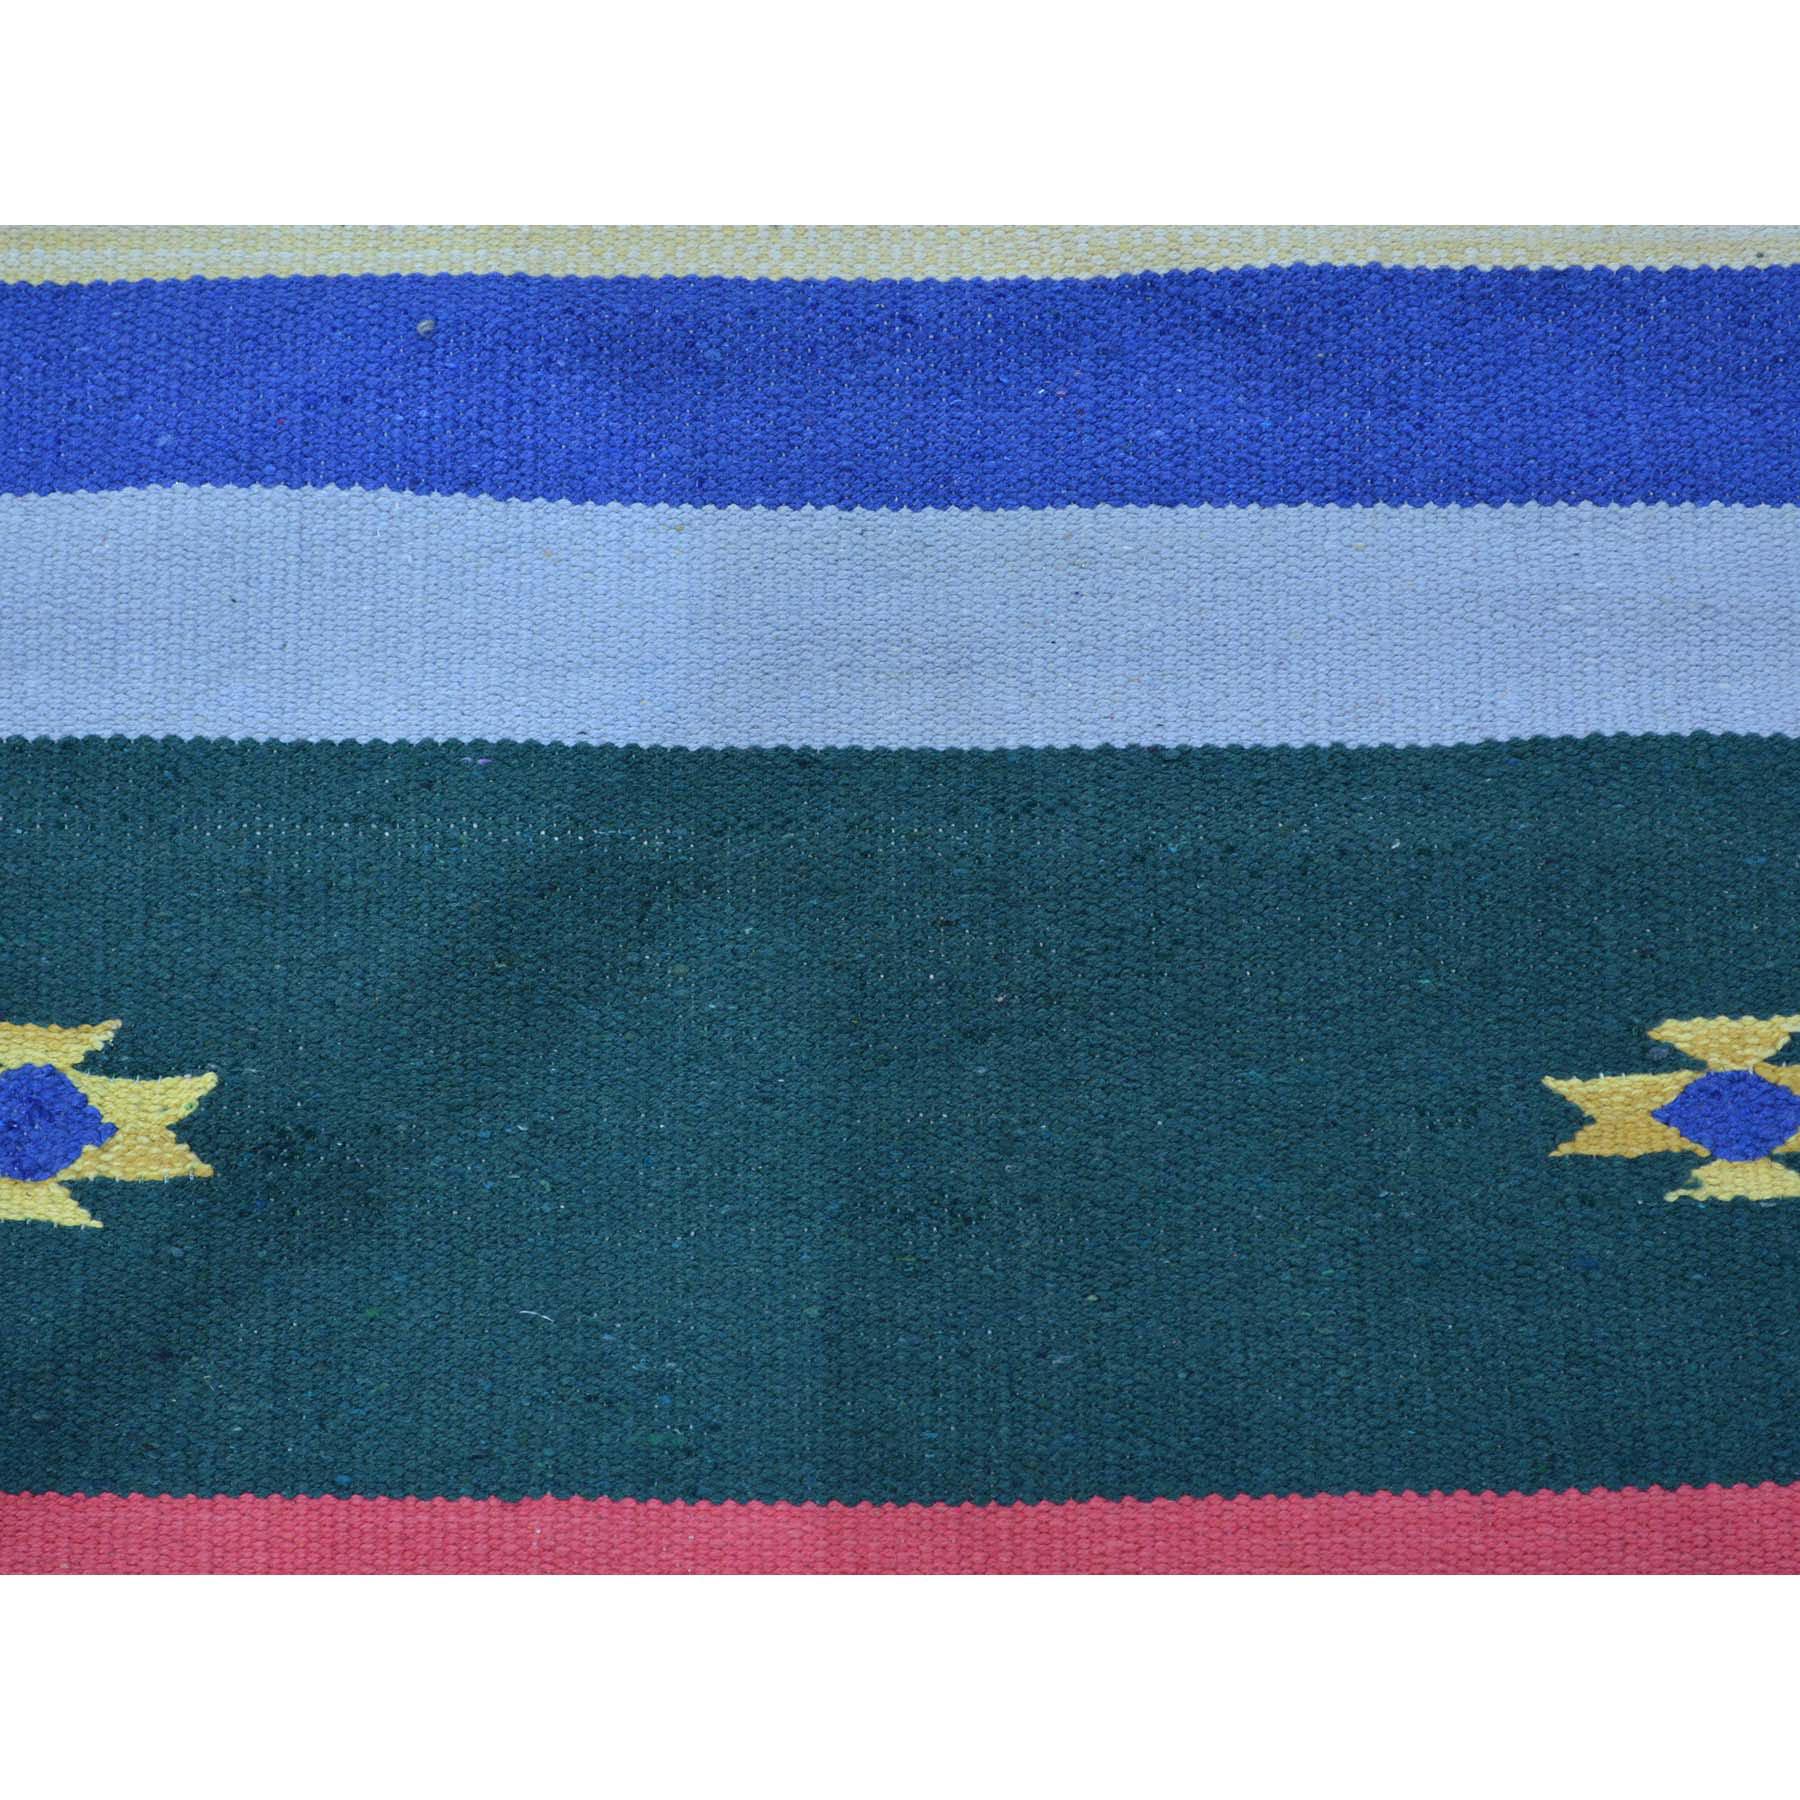 2-6 x7-7  Navajo Design Runner Flat Weave Kilim Hand Woven Rug